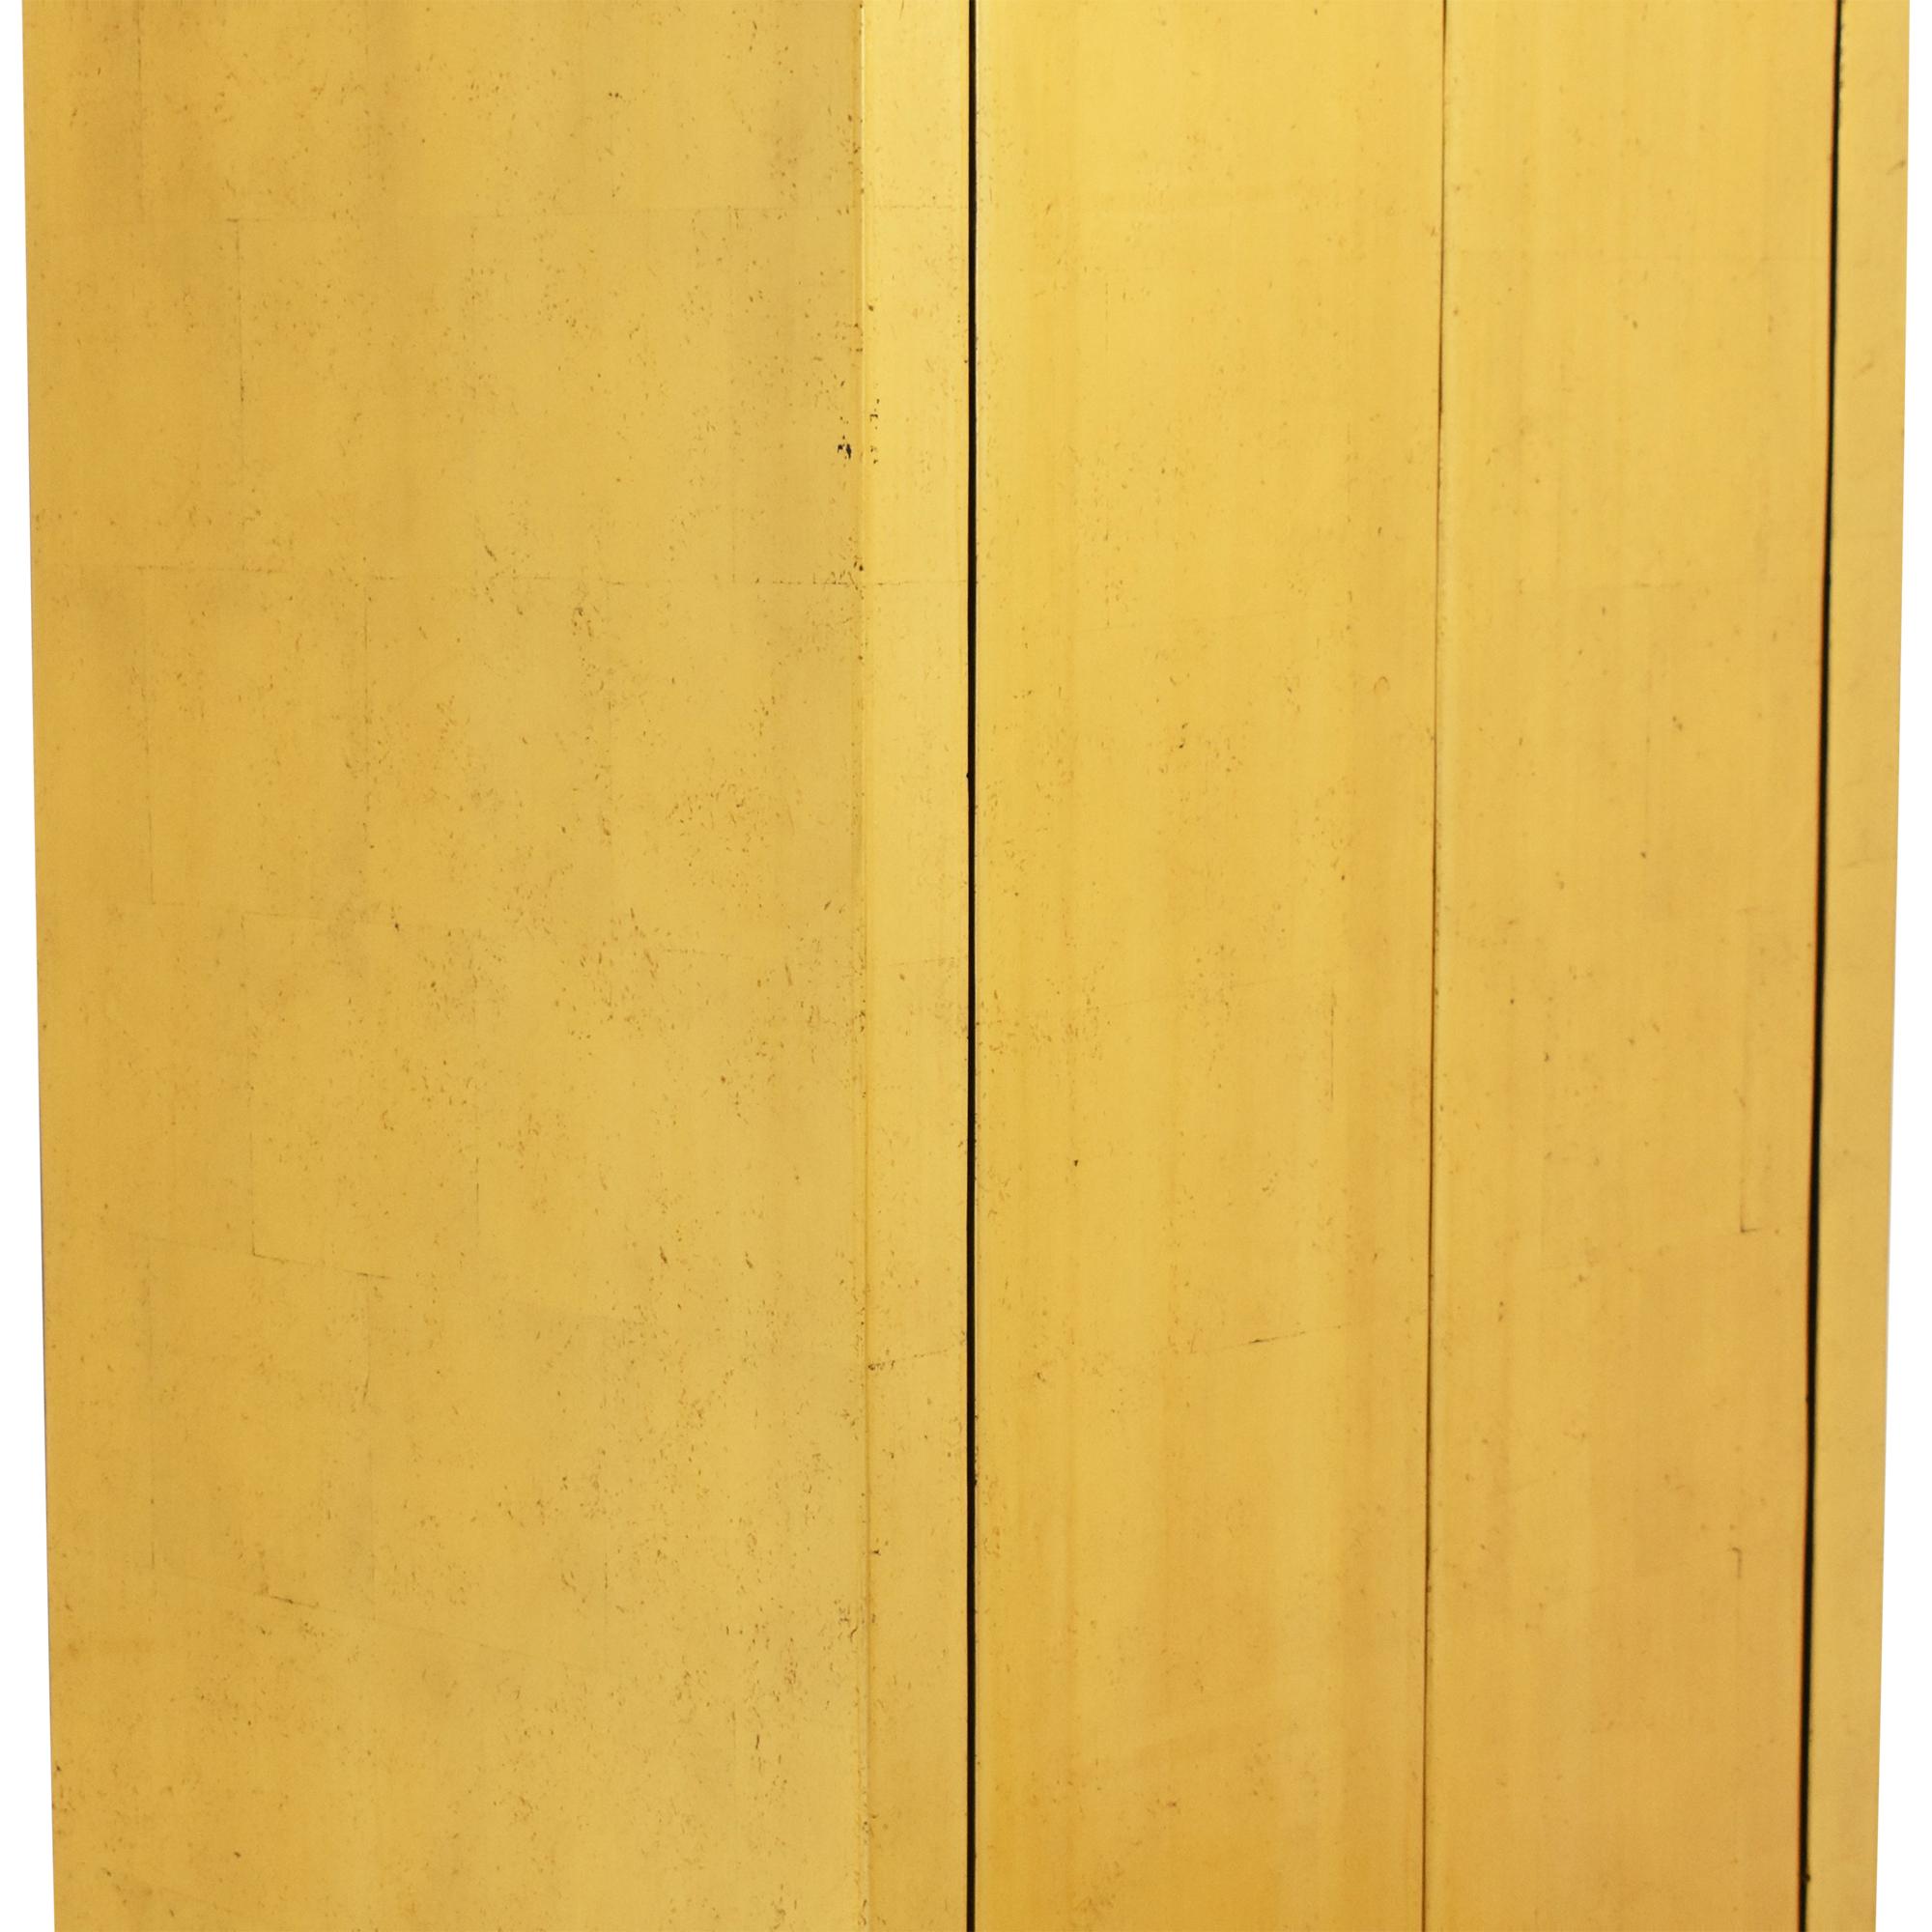 ABC Carpet & Home ABC Carpet & Home Tall Chinoiserie Cabinet ma